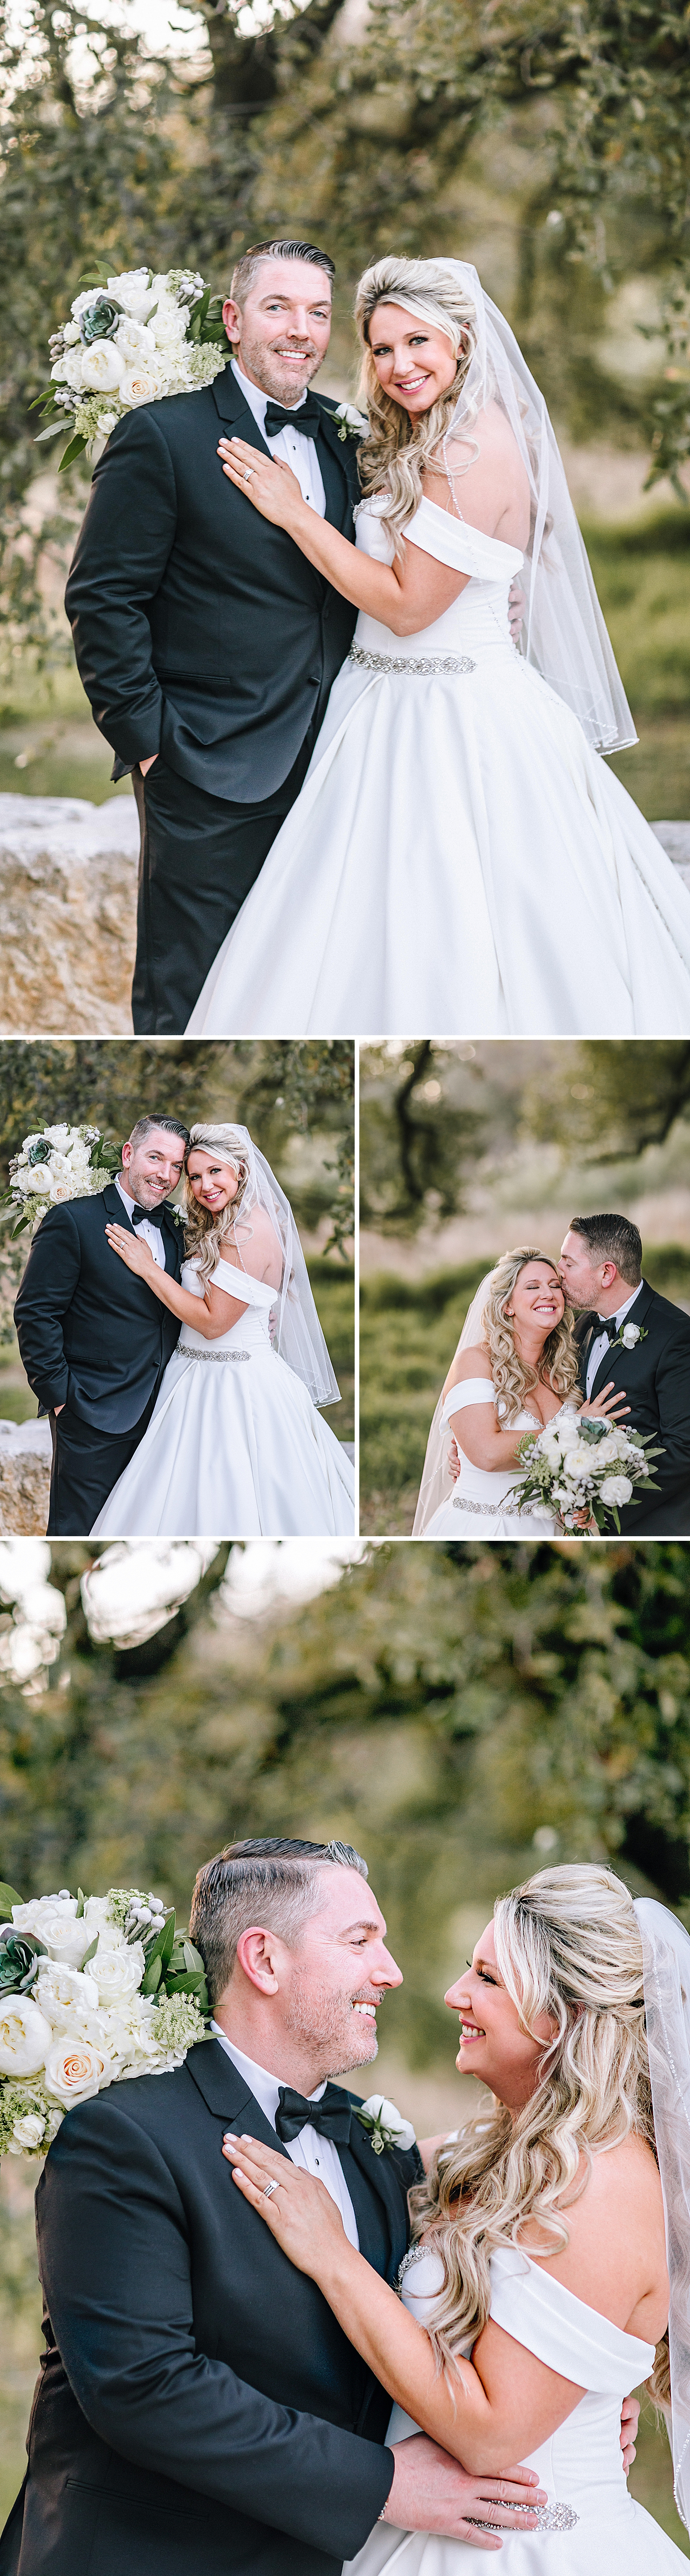 Magnolia-Halle-Wedding-San-Antonio-Texas-Bride-Grom_0066.jpg